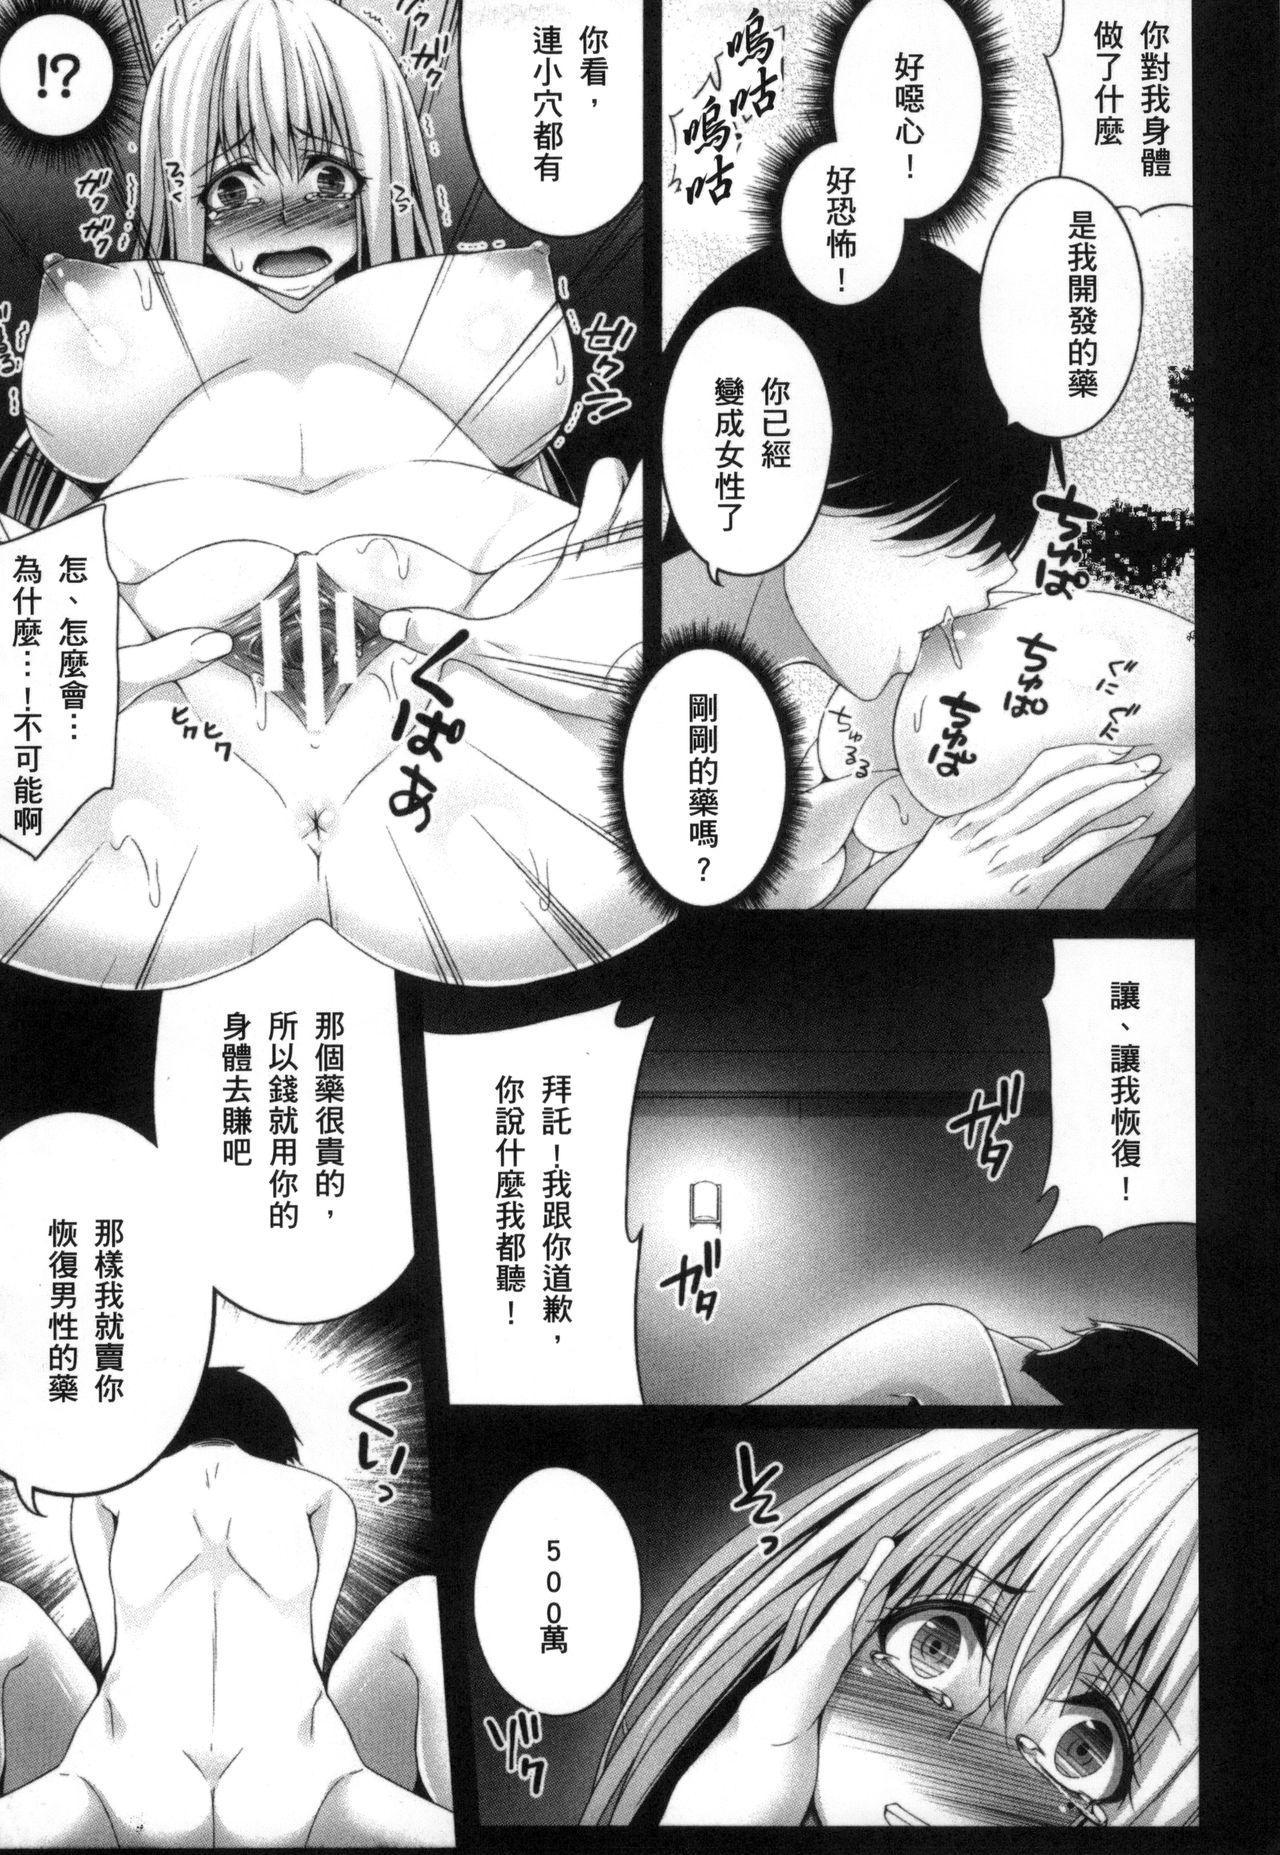 2D Comic Magazine Seitenkan Shite Haramasarete Botebara End! | 性轉換與懷孕,滿腹精液收場! 69